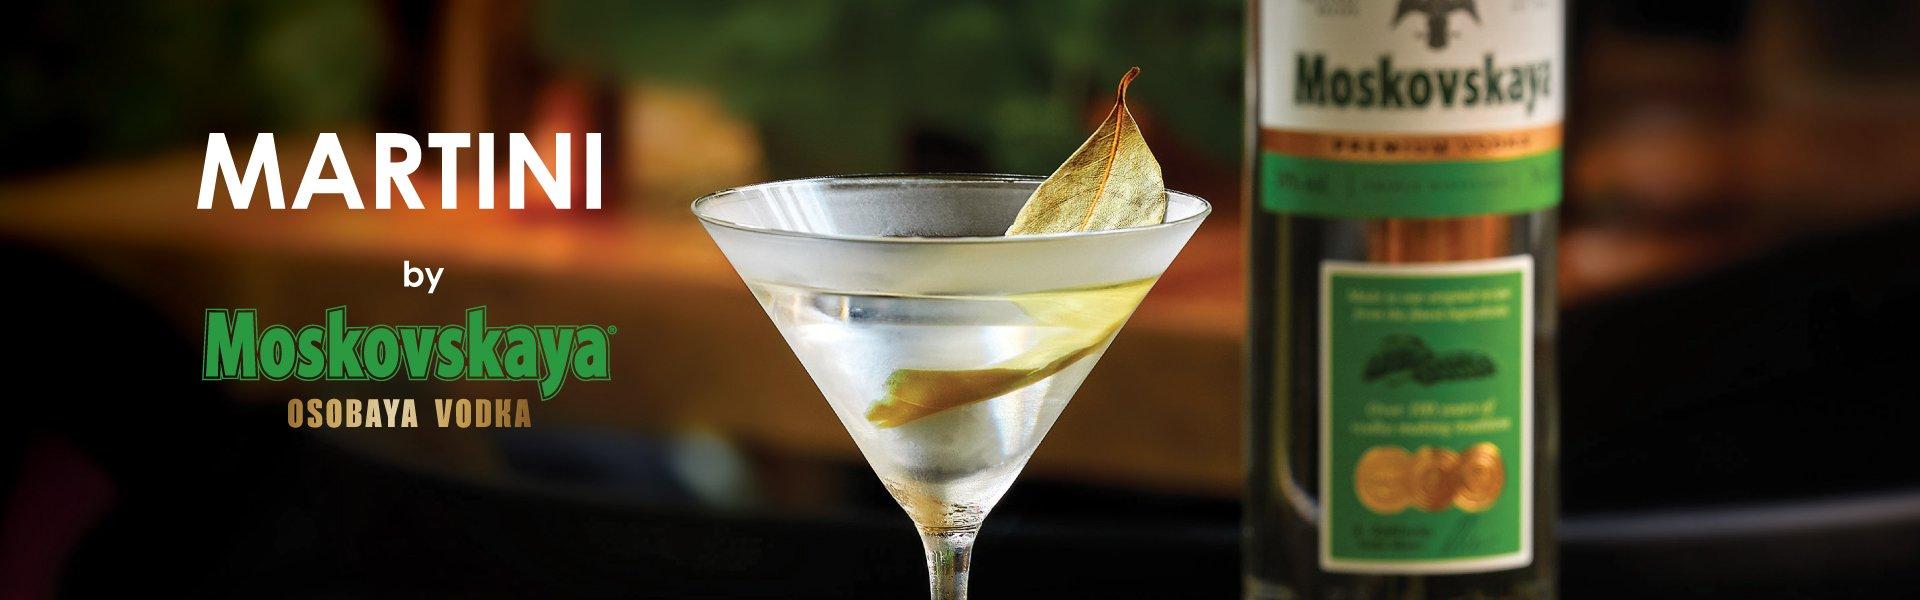 5 kokteiļi Vodka Martini ar degvīnu Moskovskaya